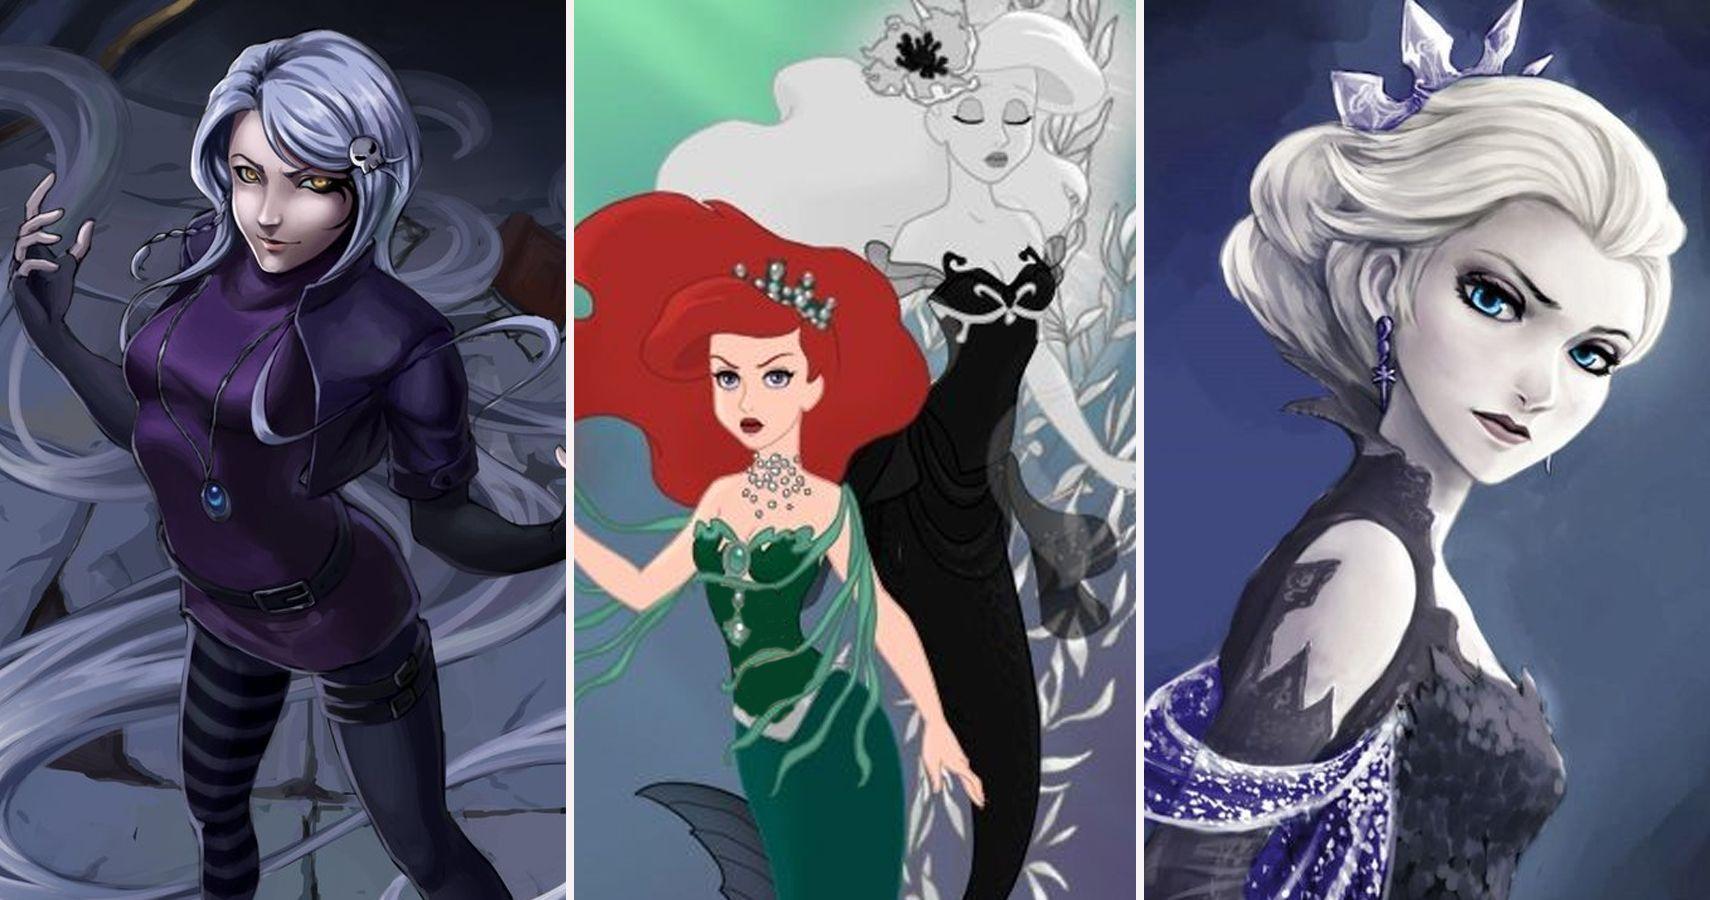 Very pity disney princess as villains